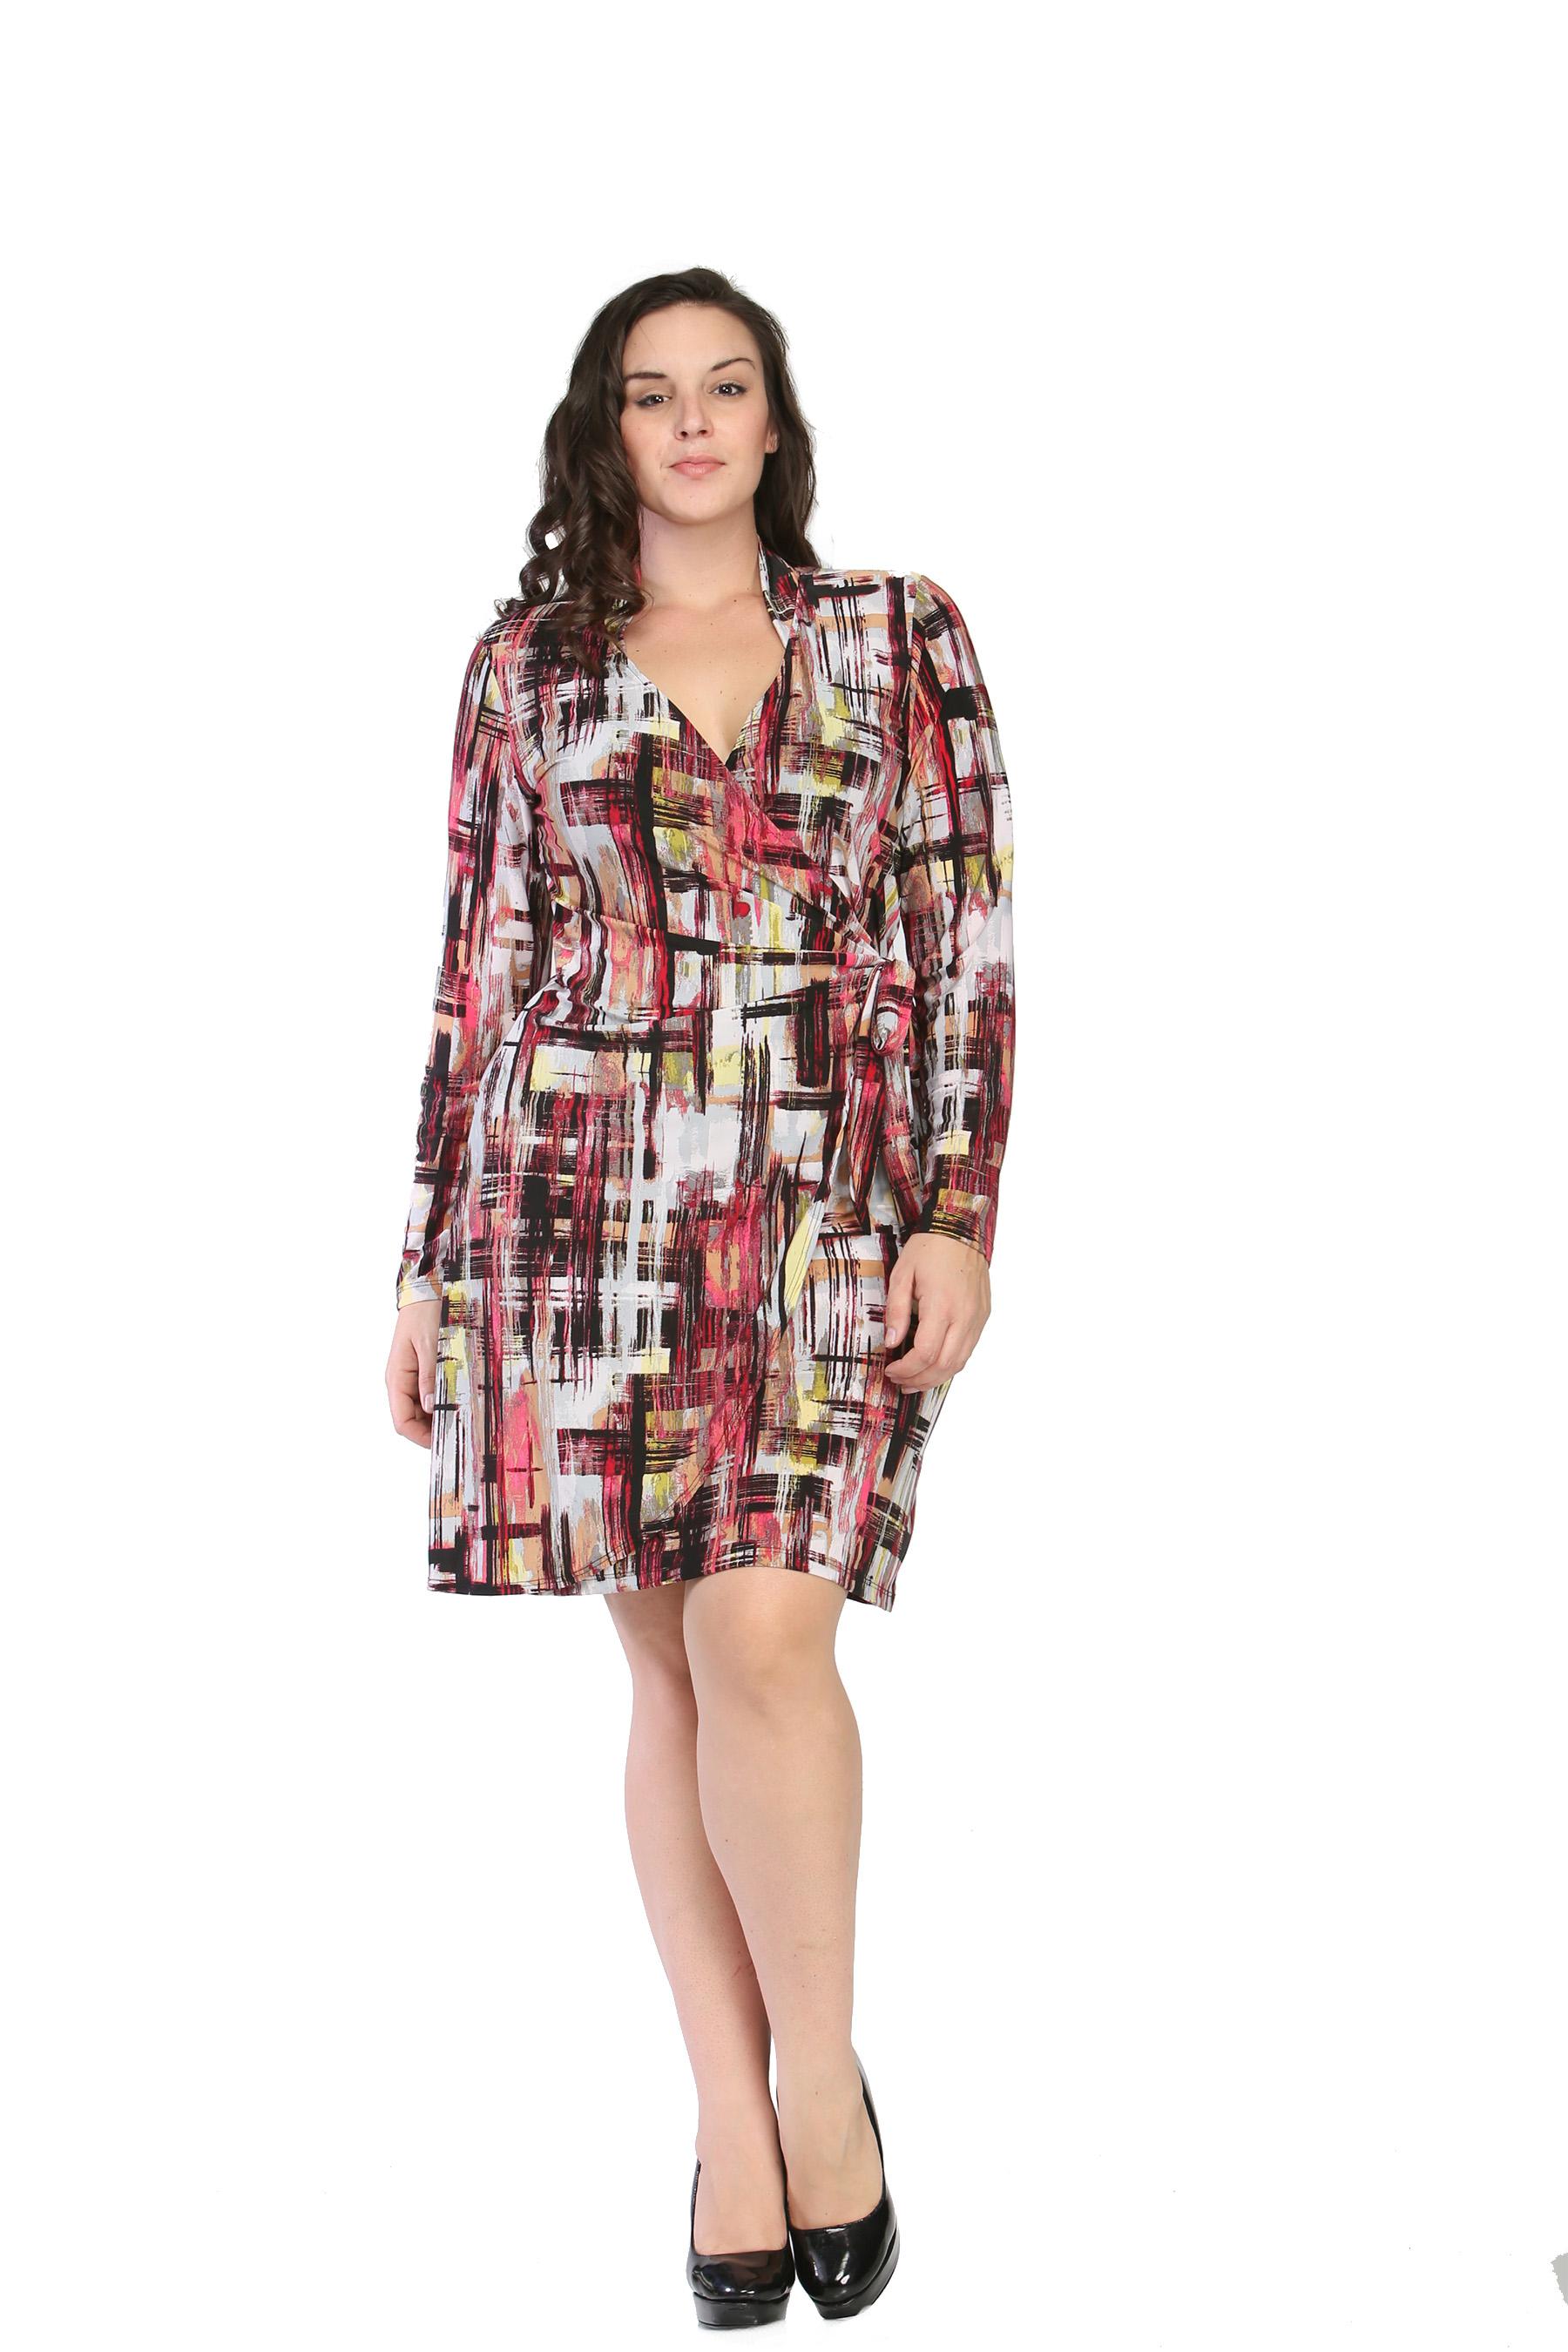 plus length dresses on ebay